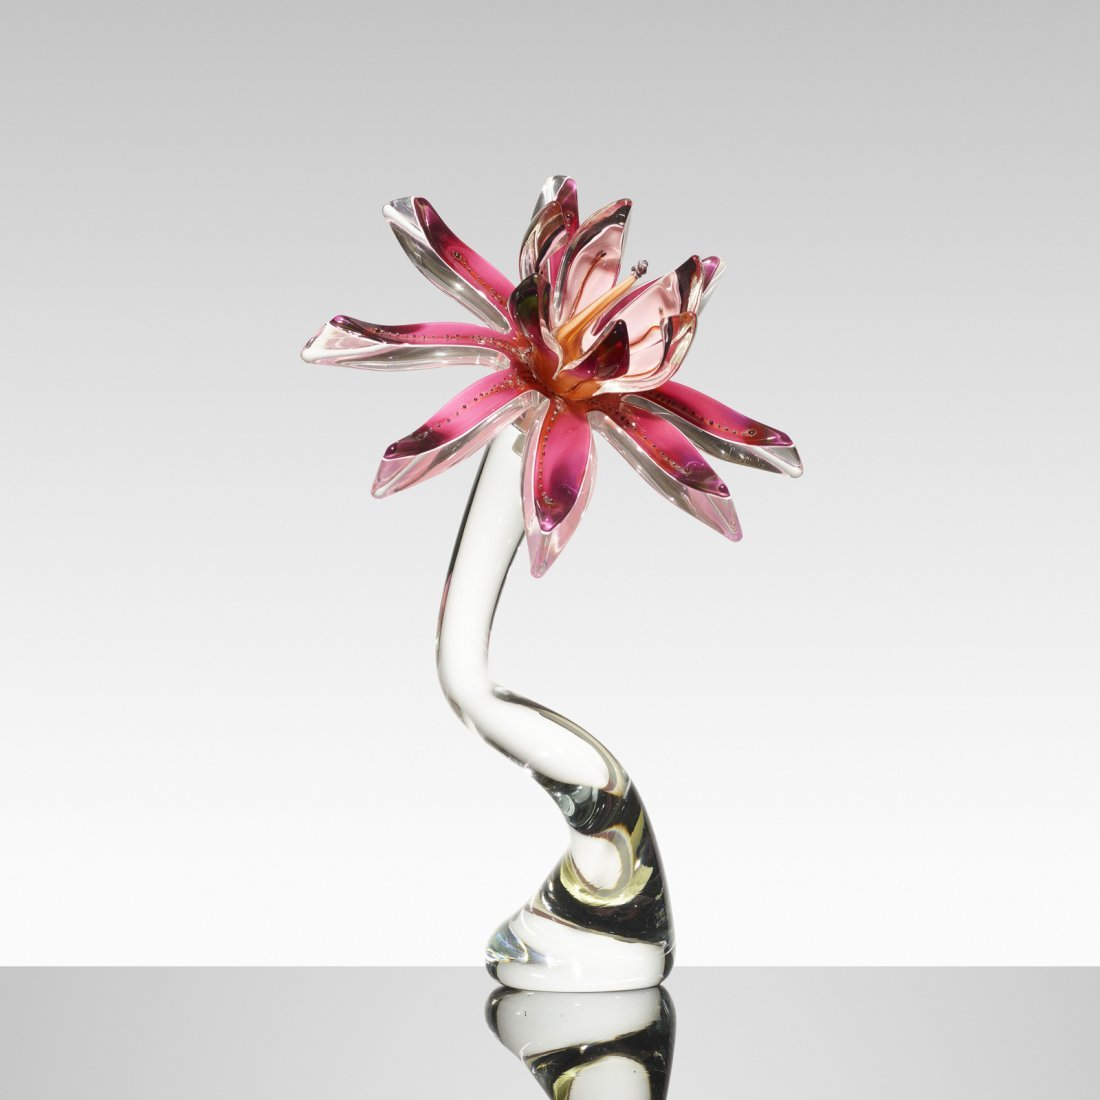 John Littleton and Kate Vogel, Aqua Flora 3-46